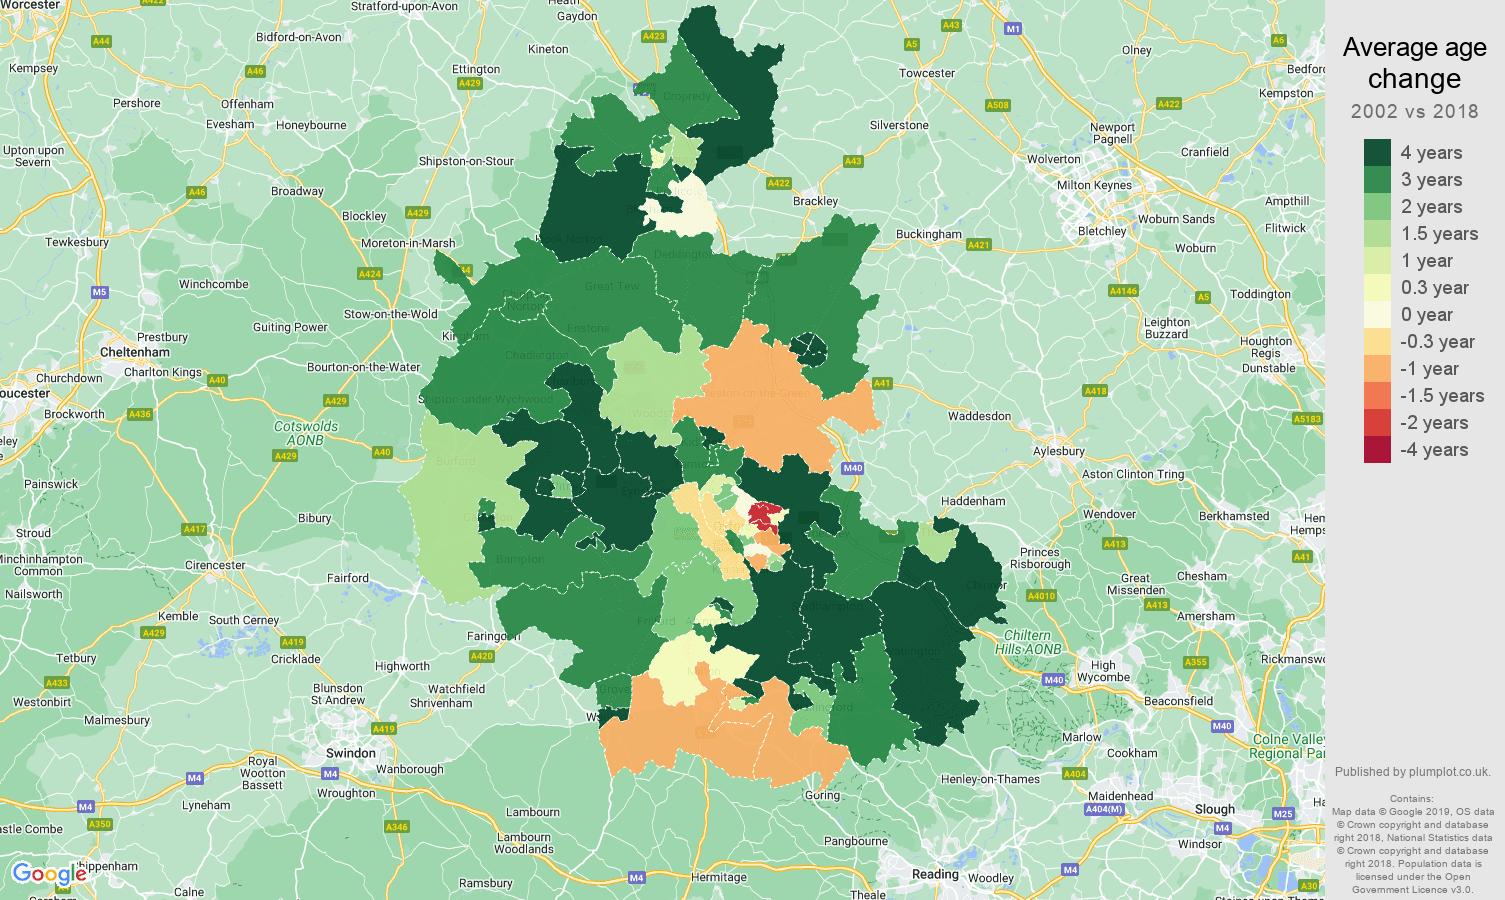 Oxford average age change map